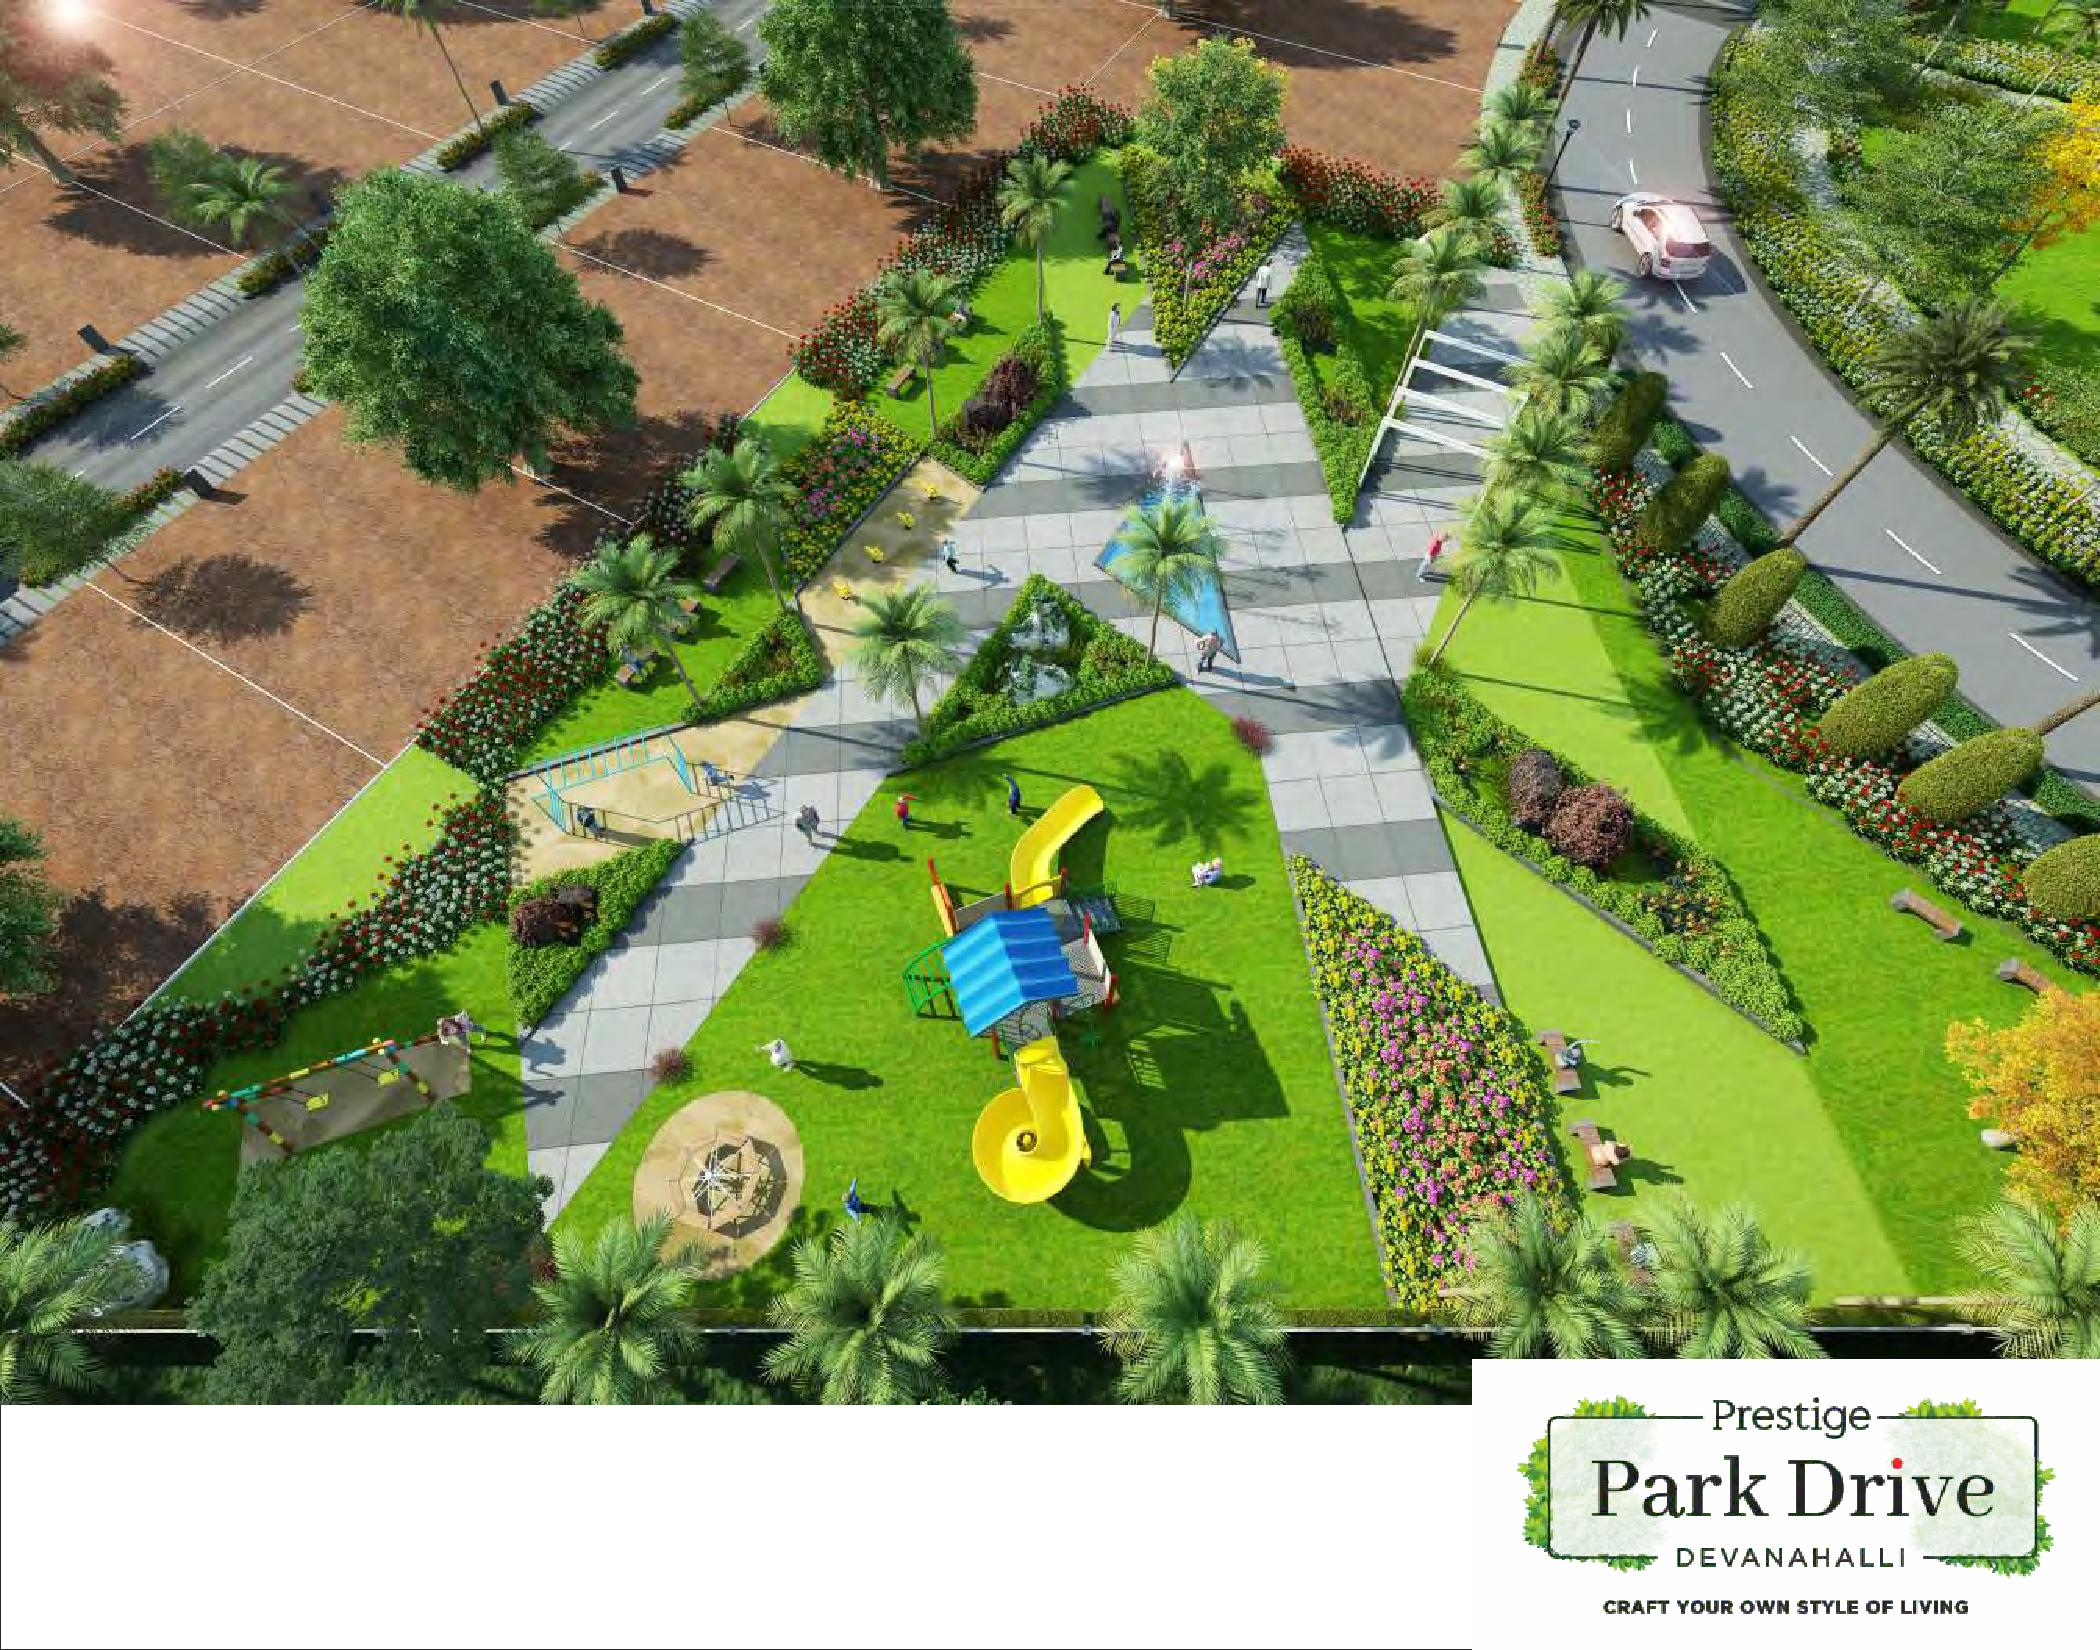 Prestige-Park-Drive-Plot-in-Devanahalli-Bangalore-Image-08